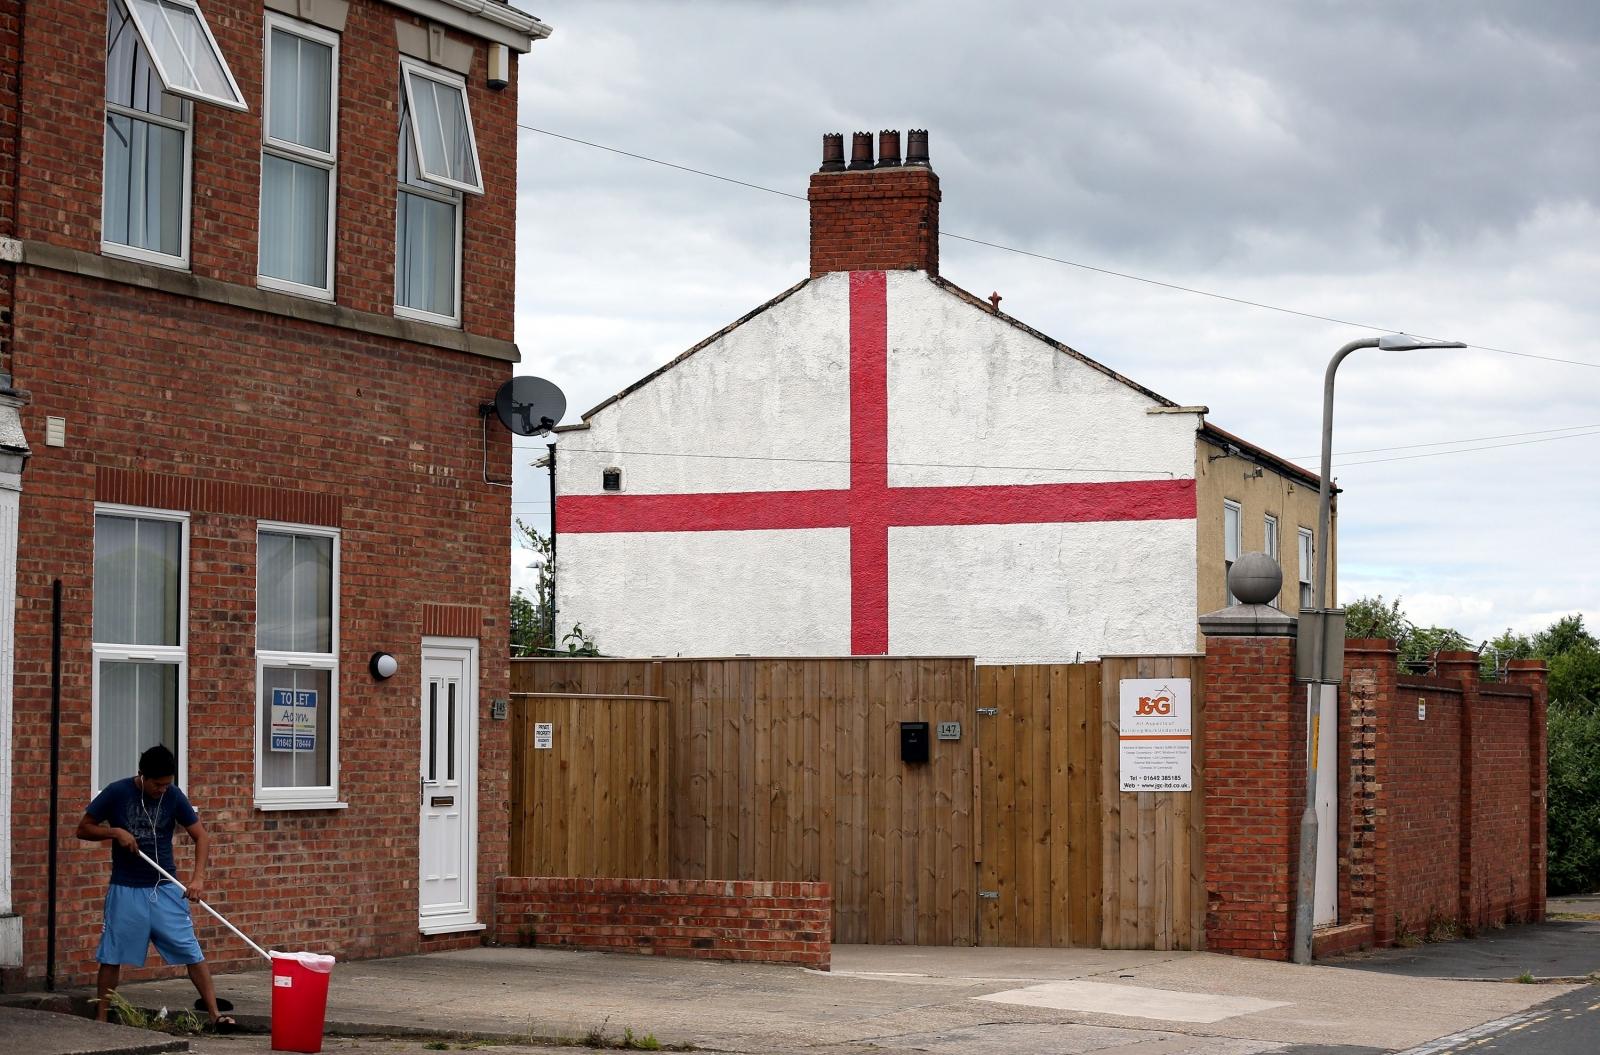 Brexit UK housing home improvement property